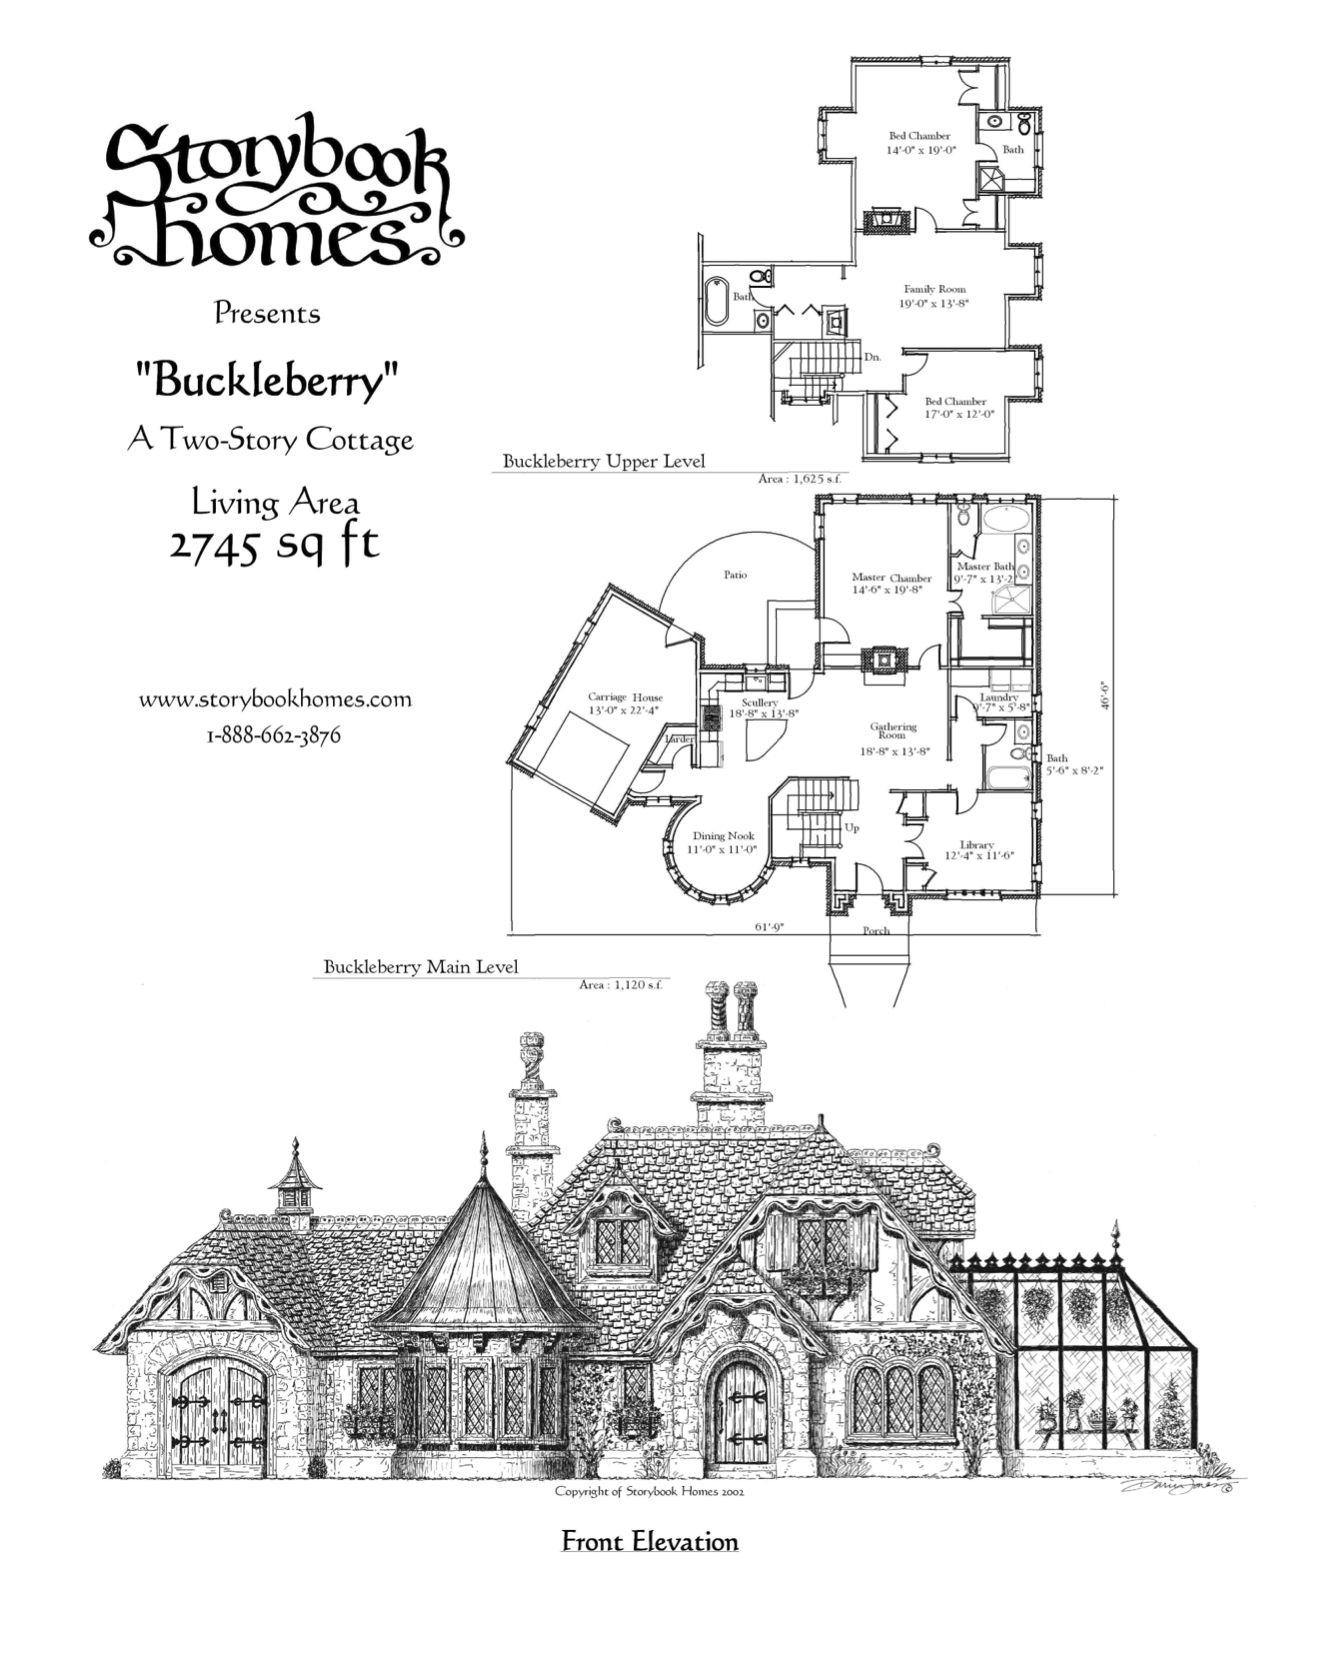 Buckleberry Houseplan Via Storybook Homes Storybook House Plan Storybook Homes Cottage Floor Plans